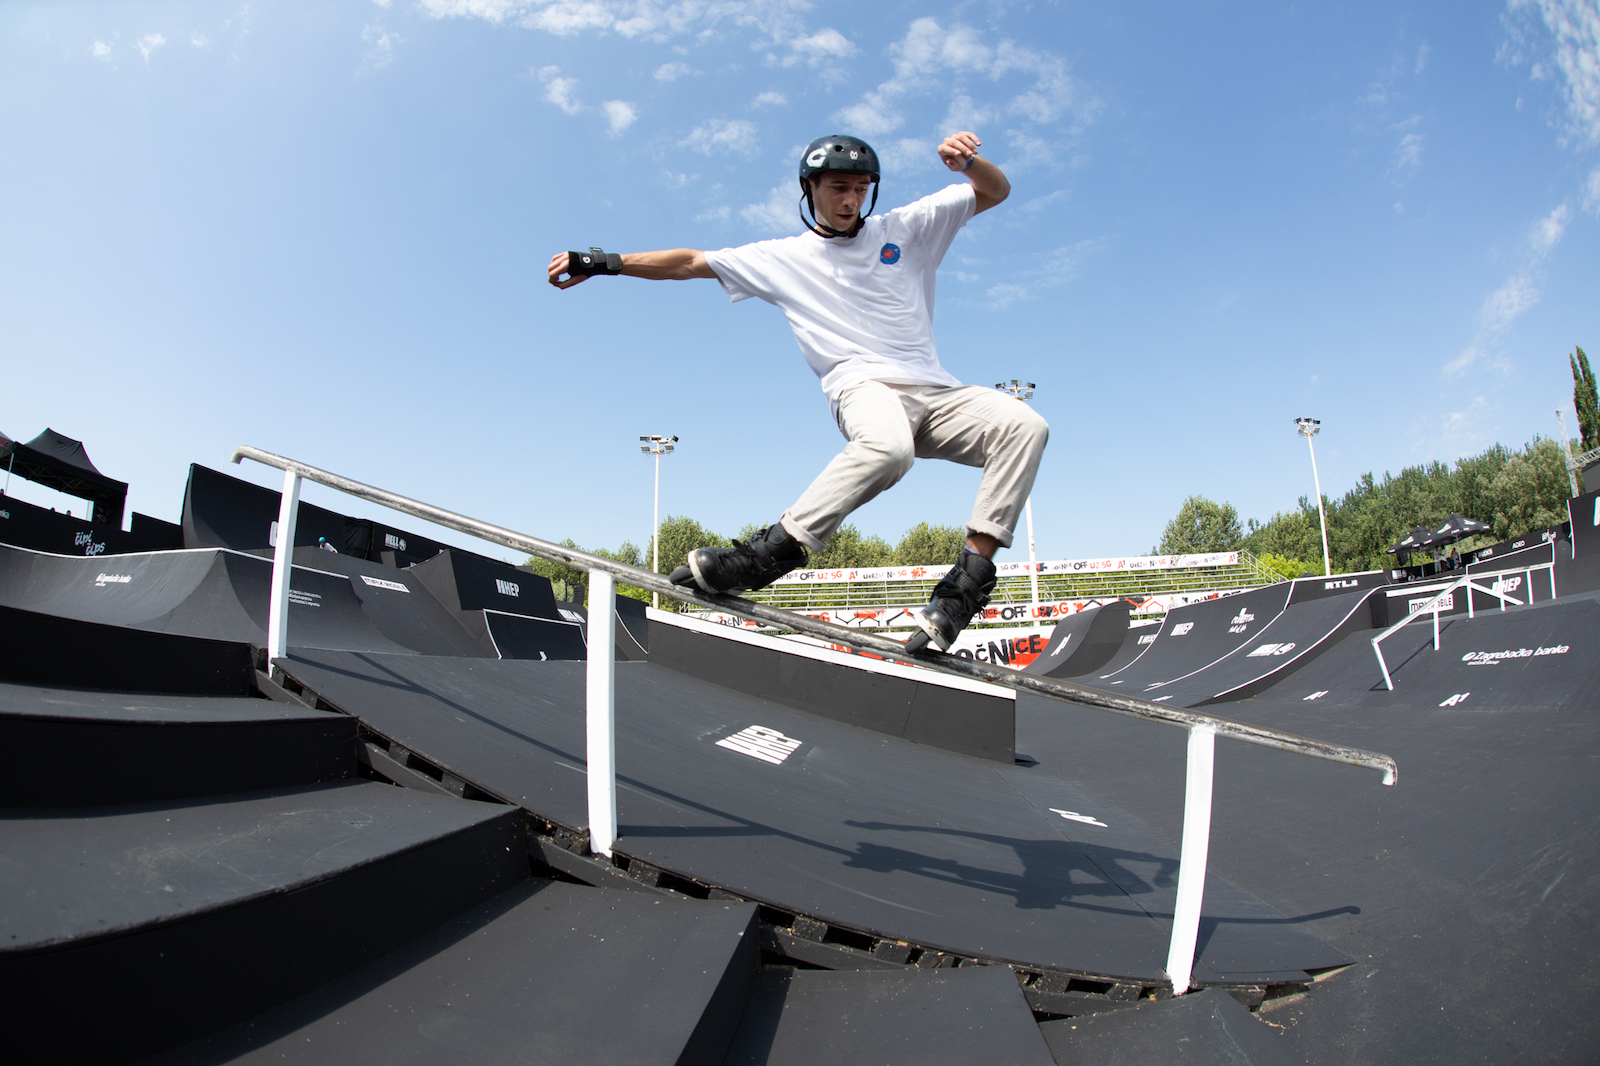 Showman Diako Diaby rocks the start of the 22nd PC on Inline skates